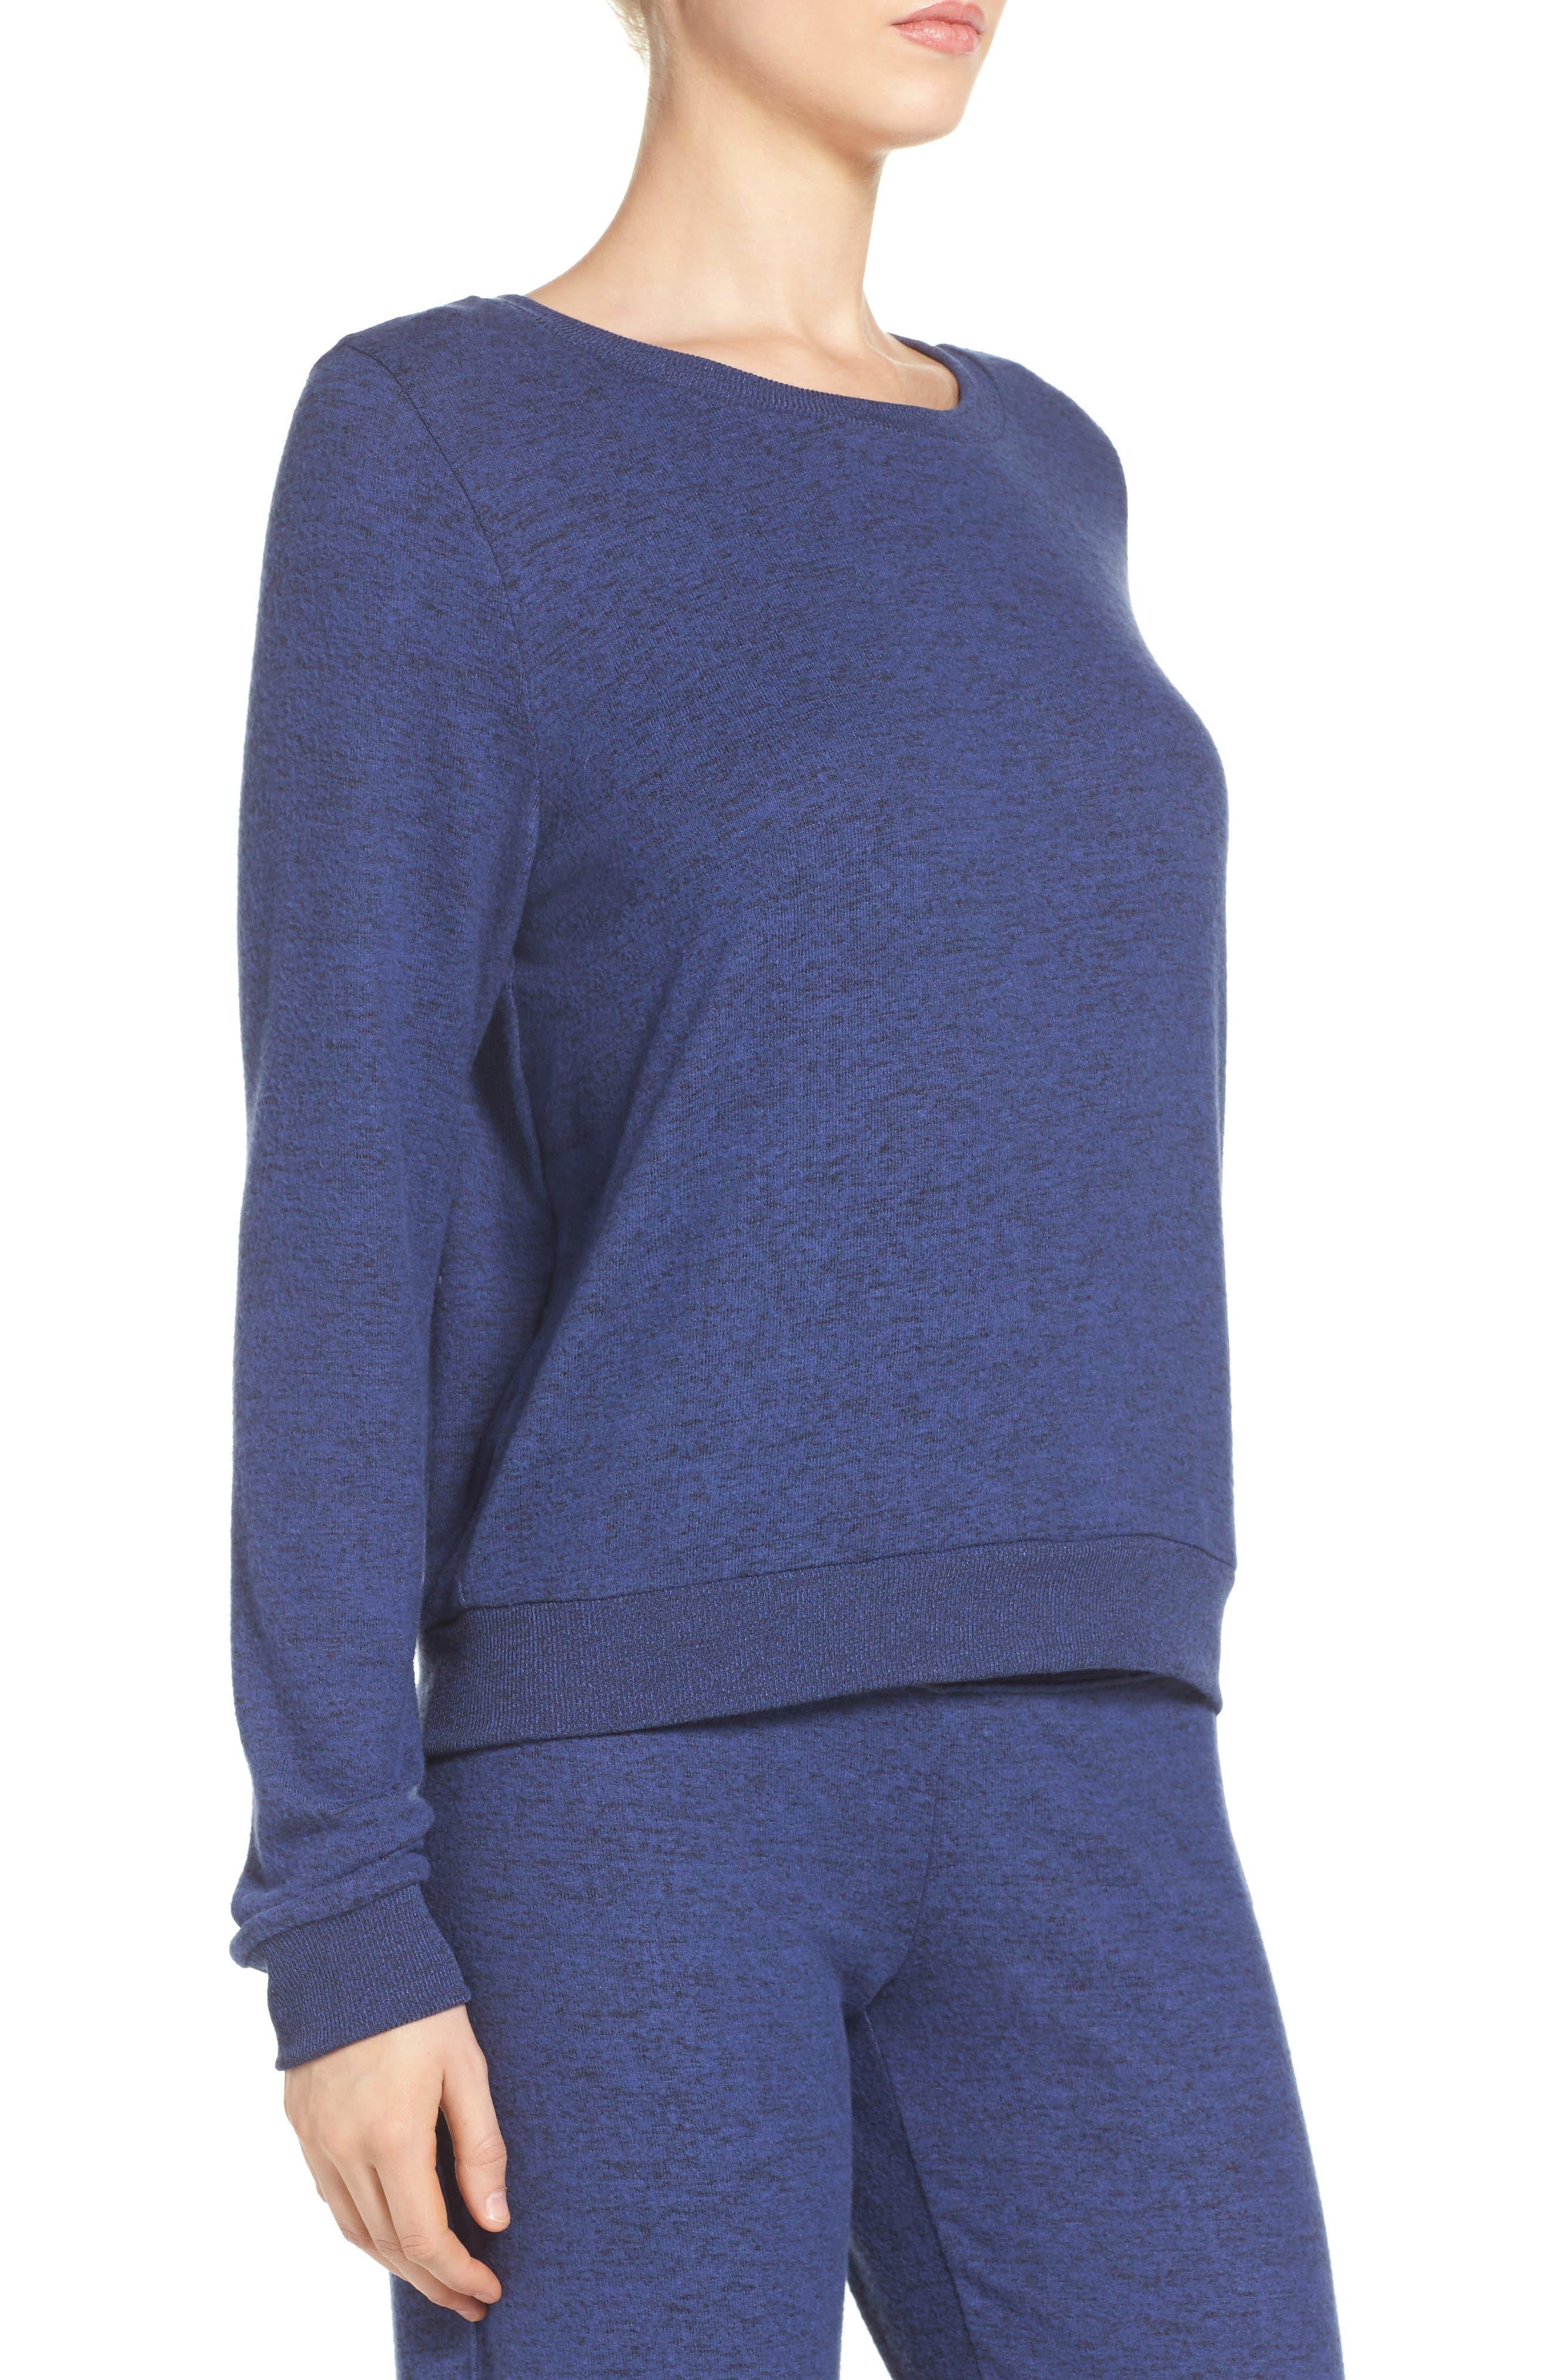 Brushed Hacci Sweatshirt,                             Alternate thumbnail 61, color,